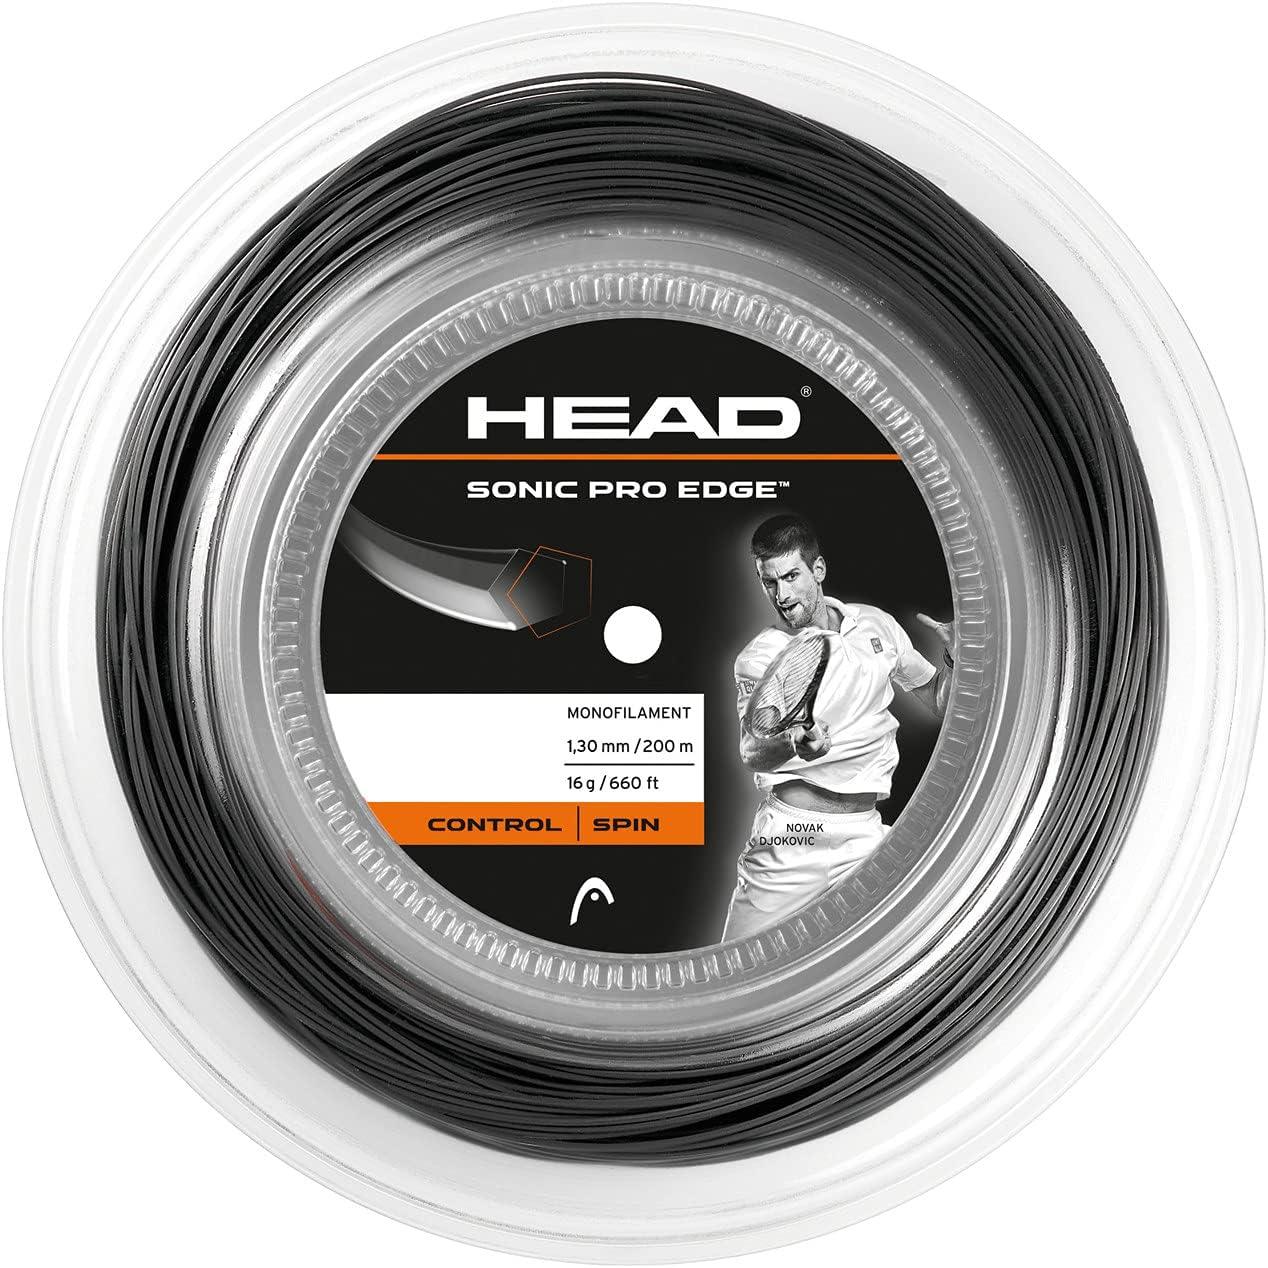 HEAD Sonic Pro Edge online shop String Tennis Reel Direct stock discount